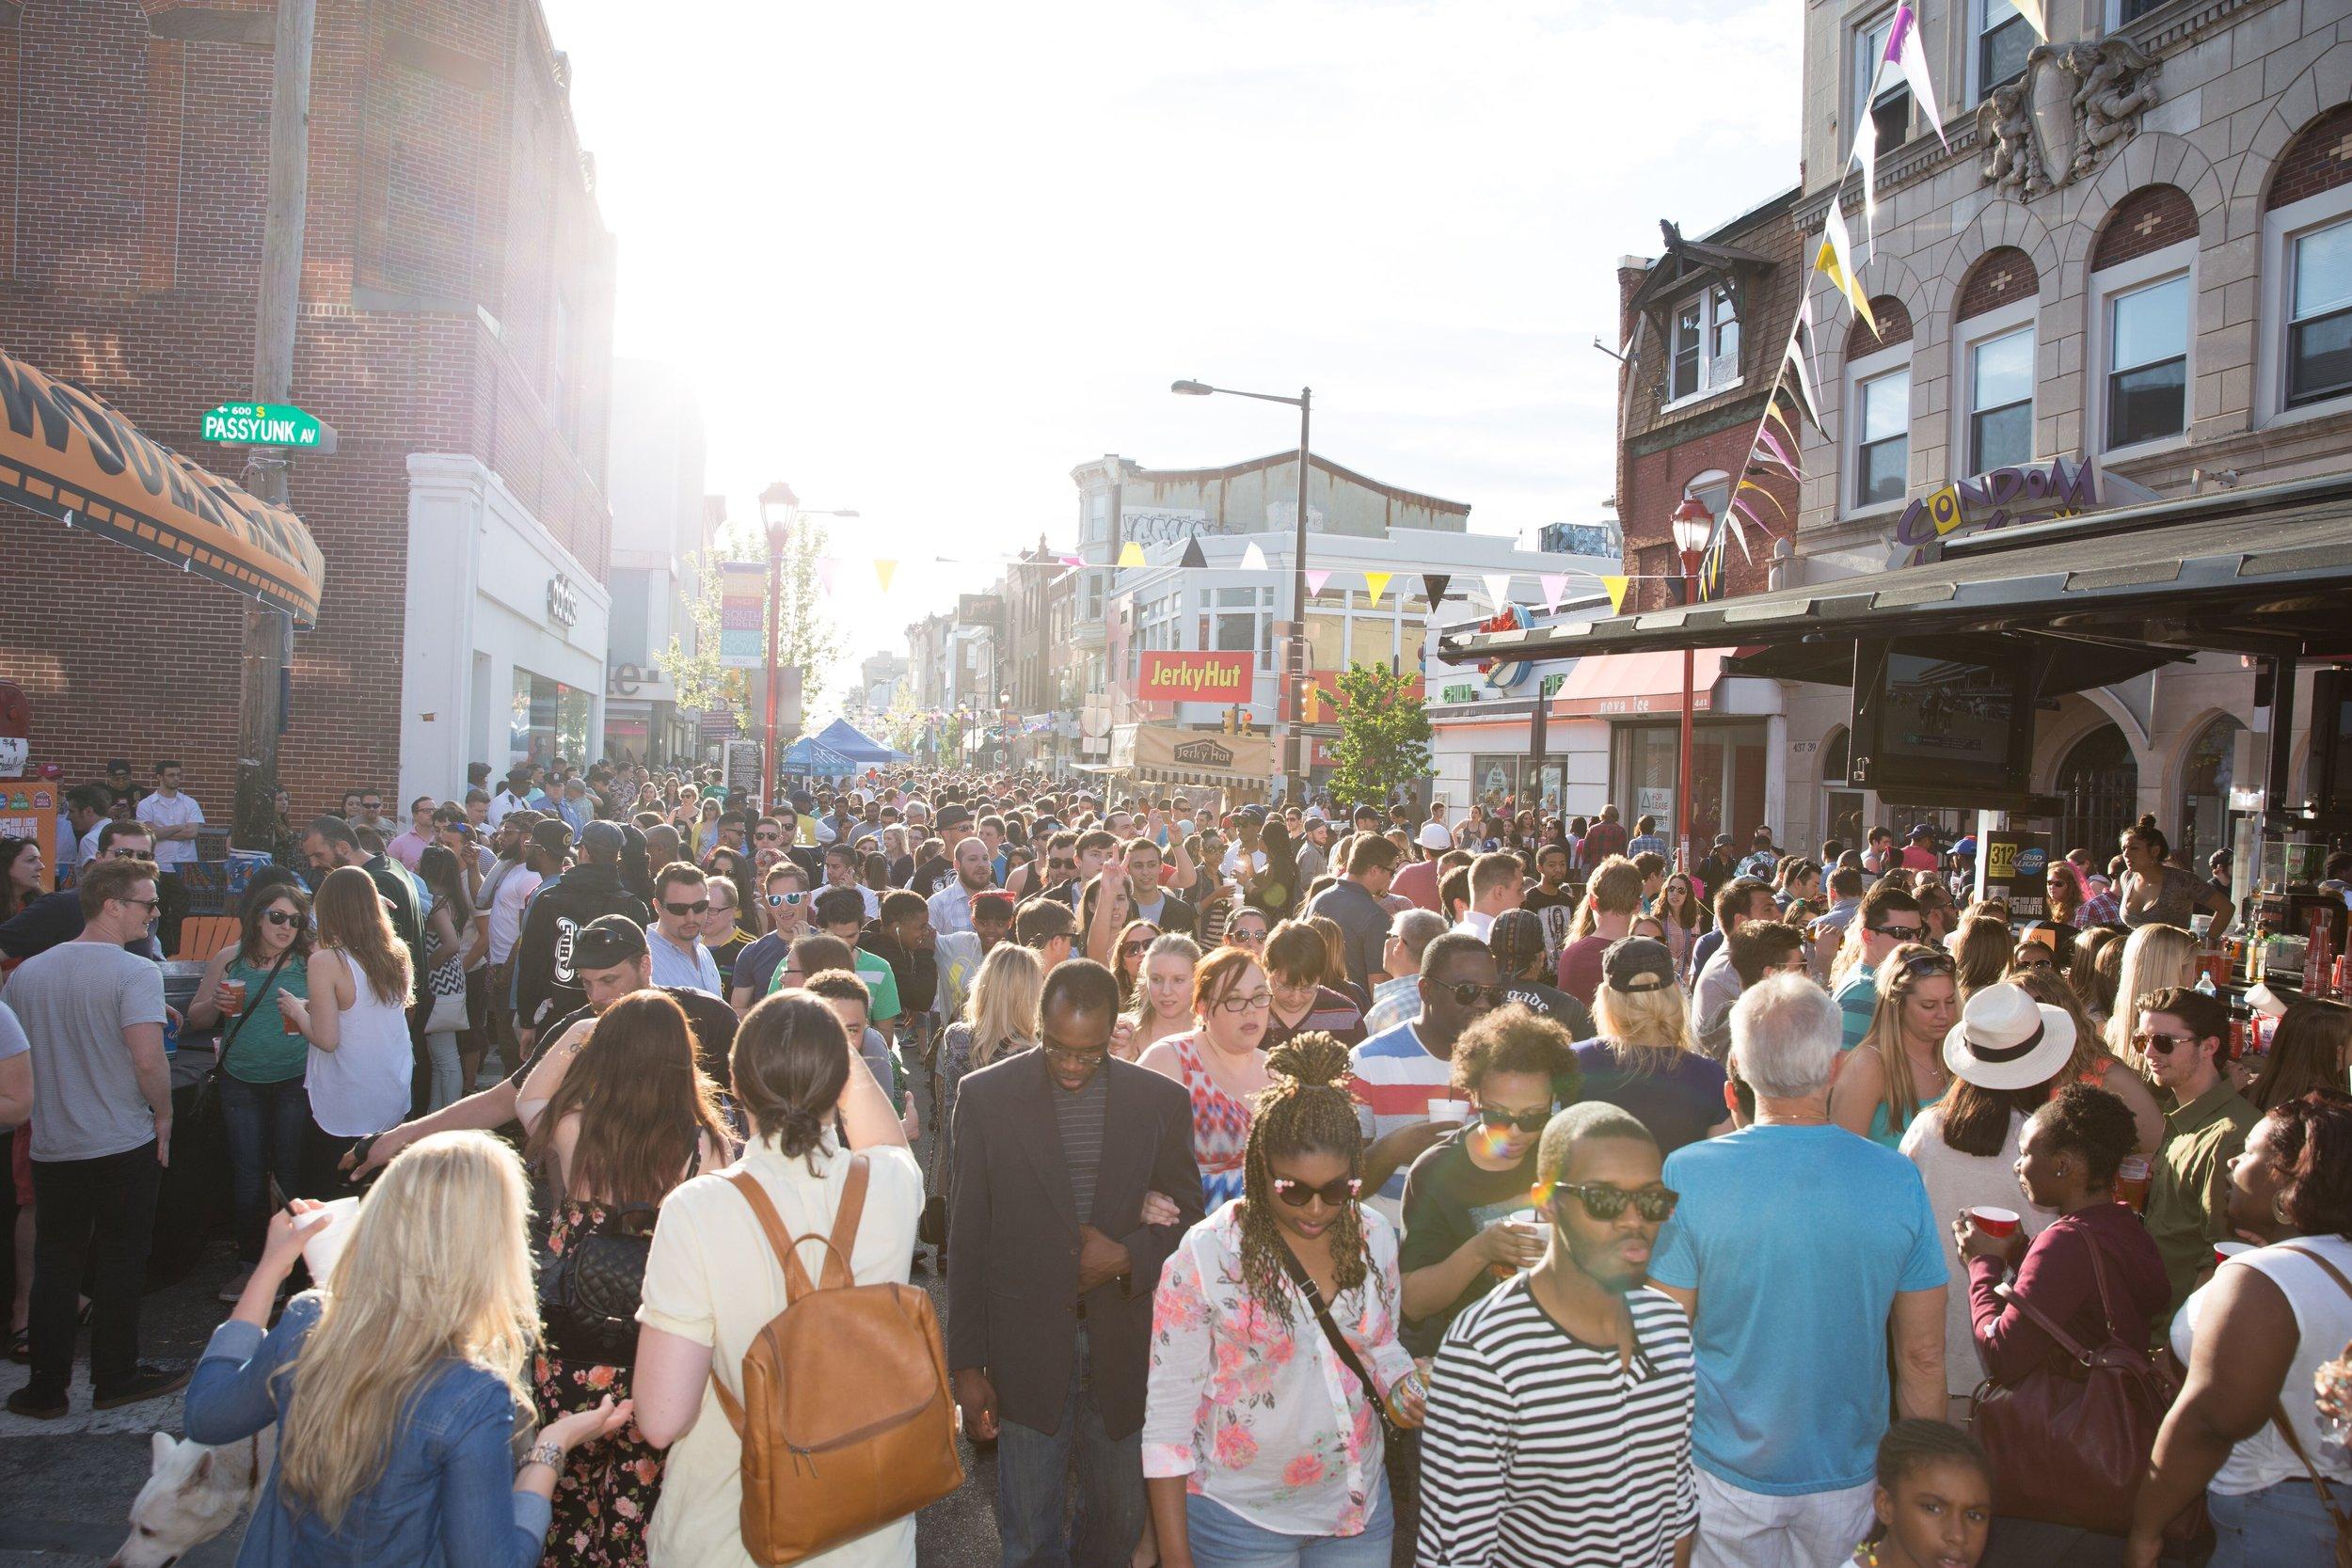 South Street Spring Festival 2018 Crowd